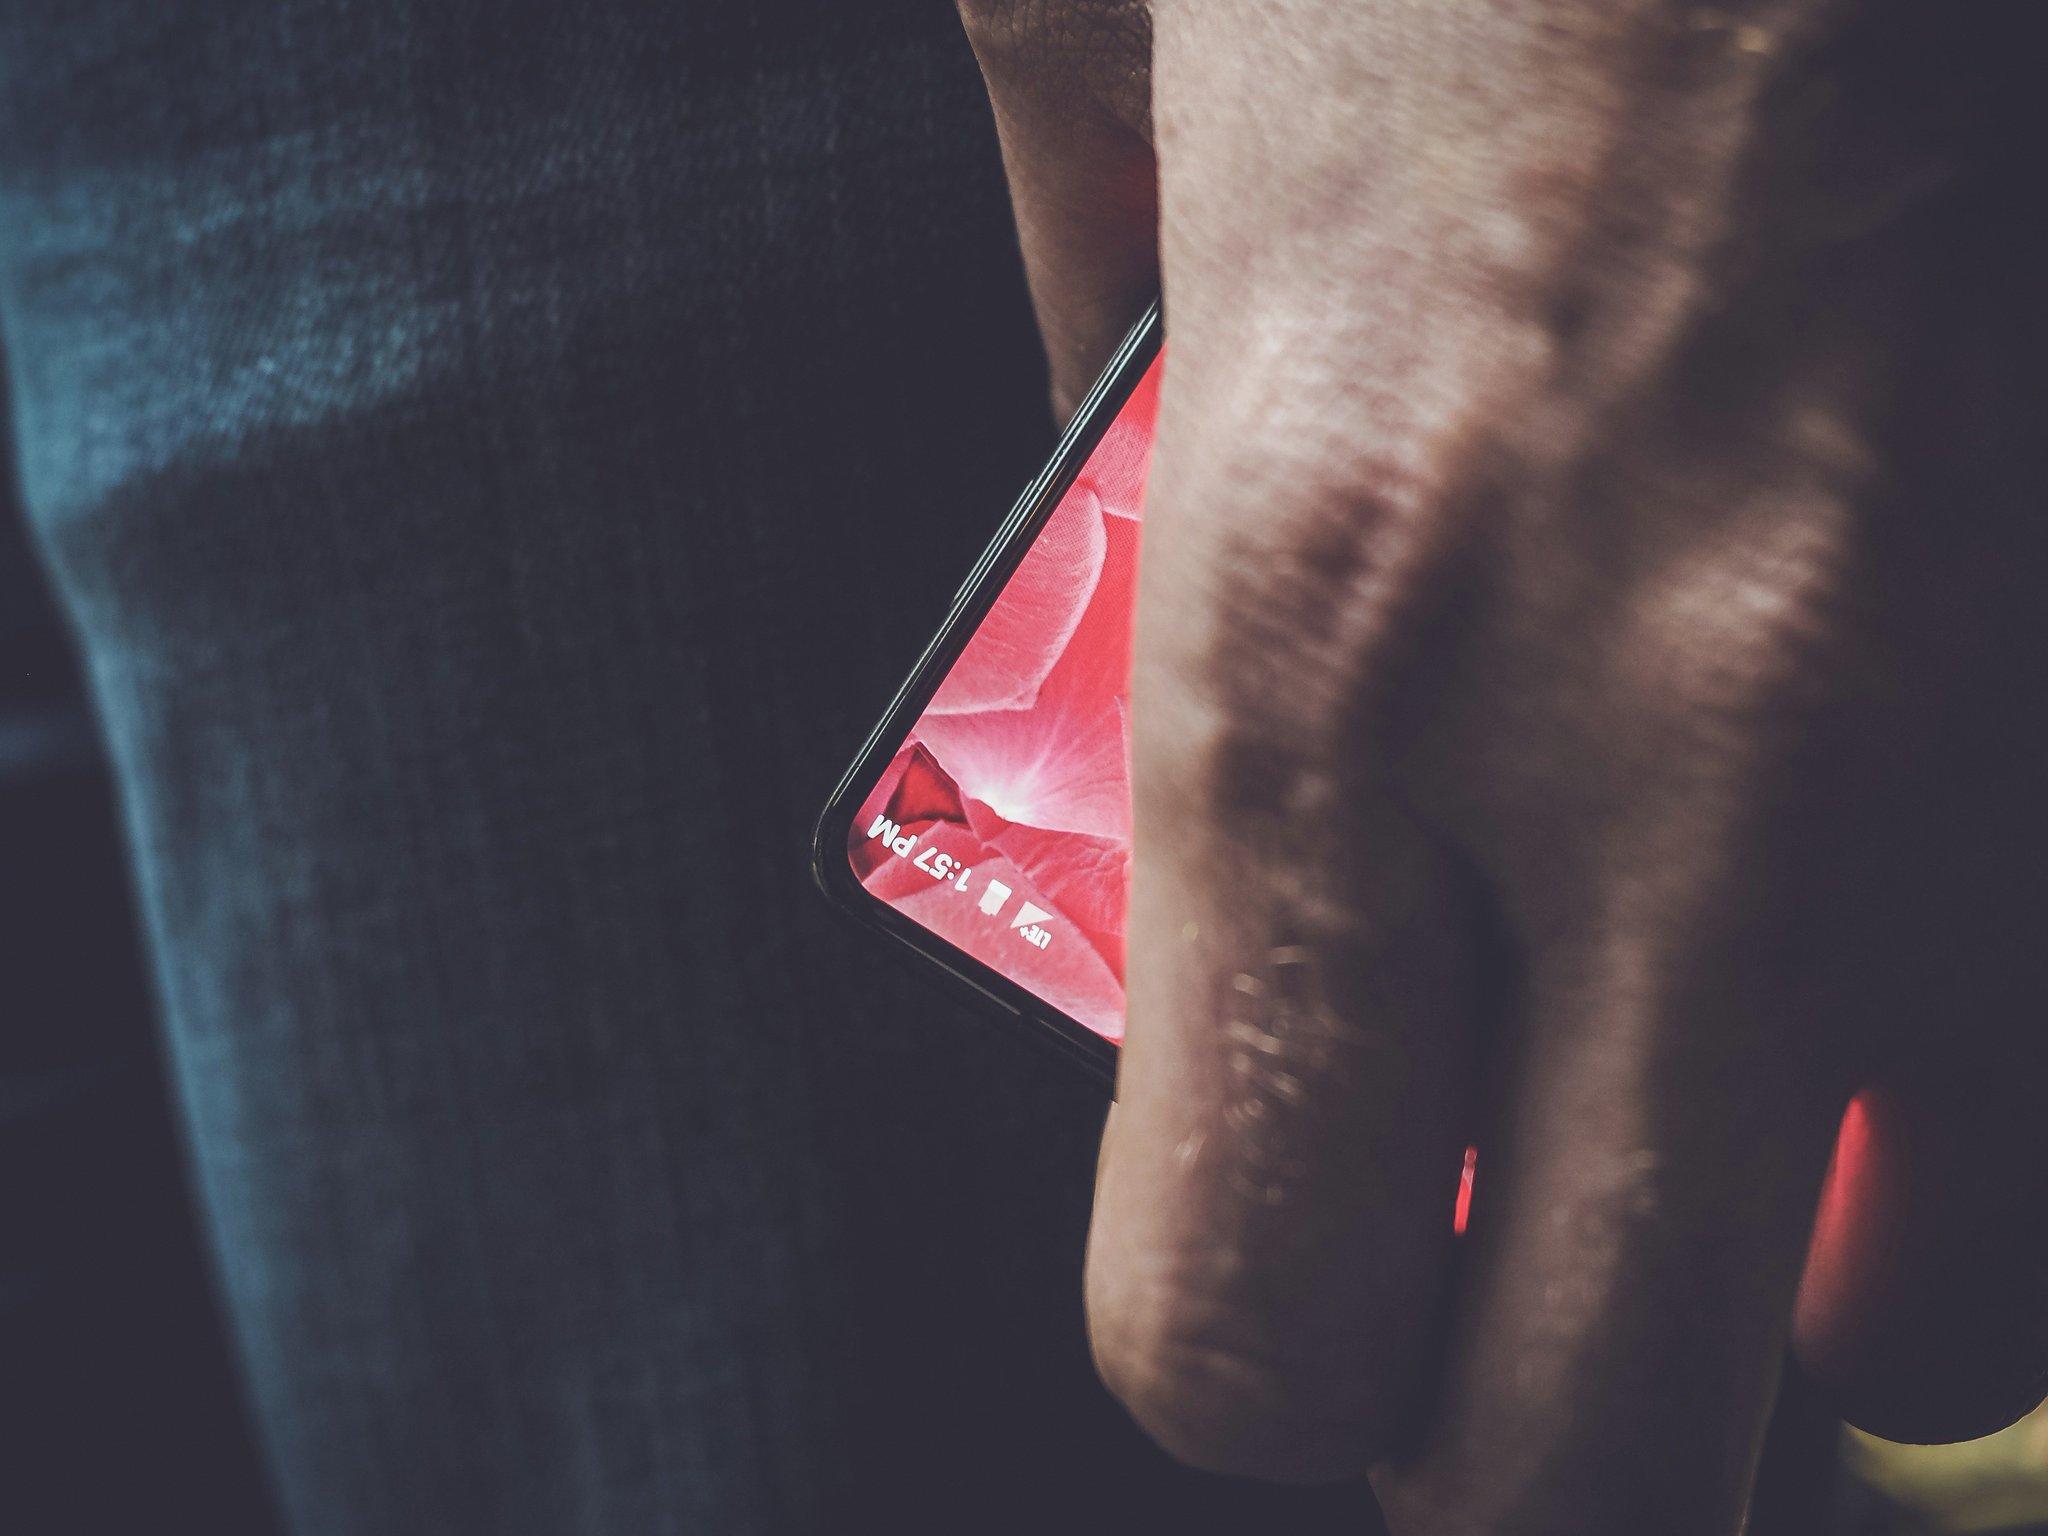 andy rubin essential smartphone